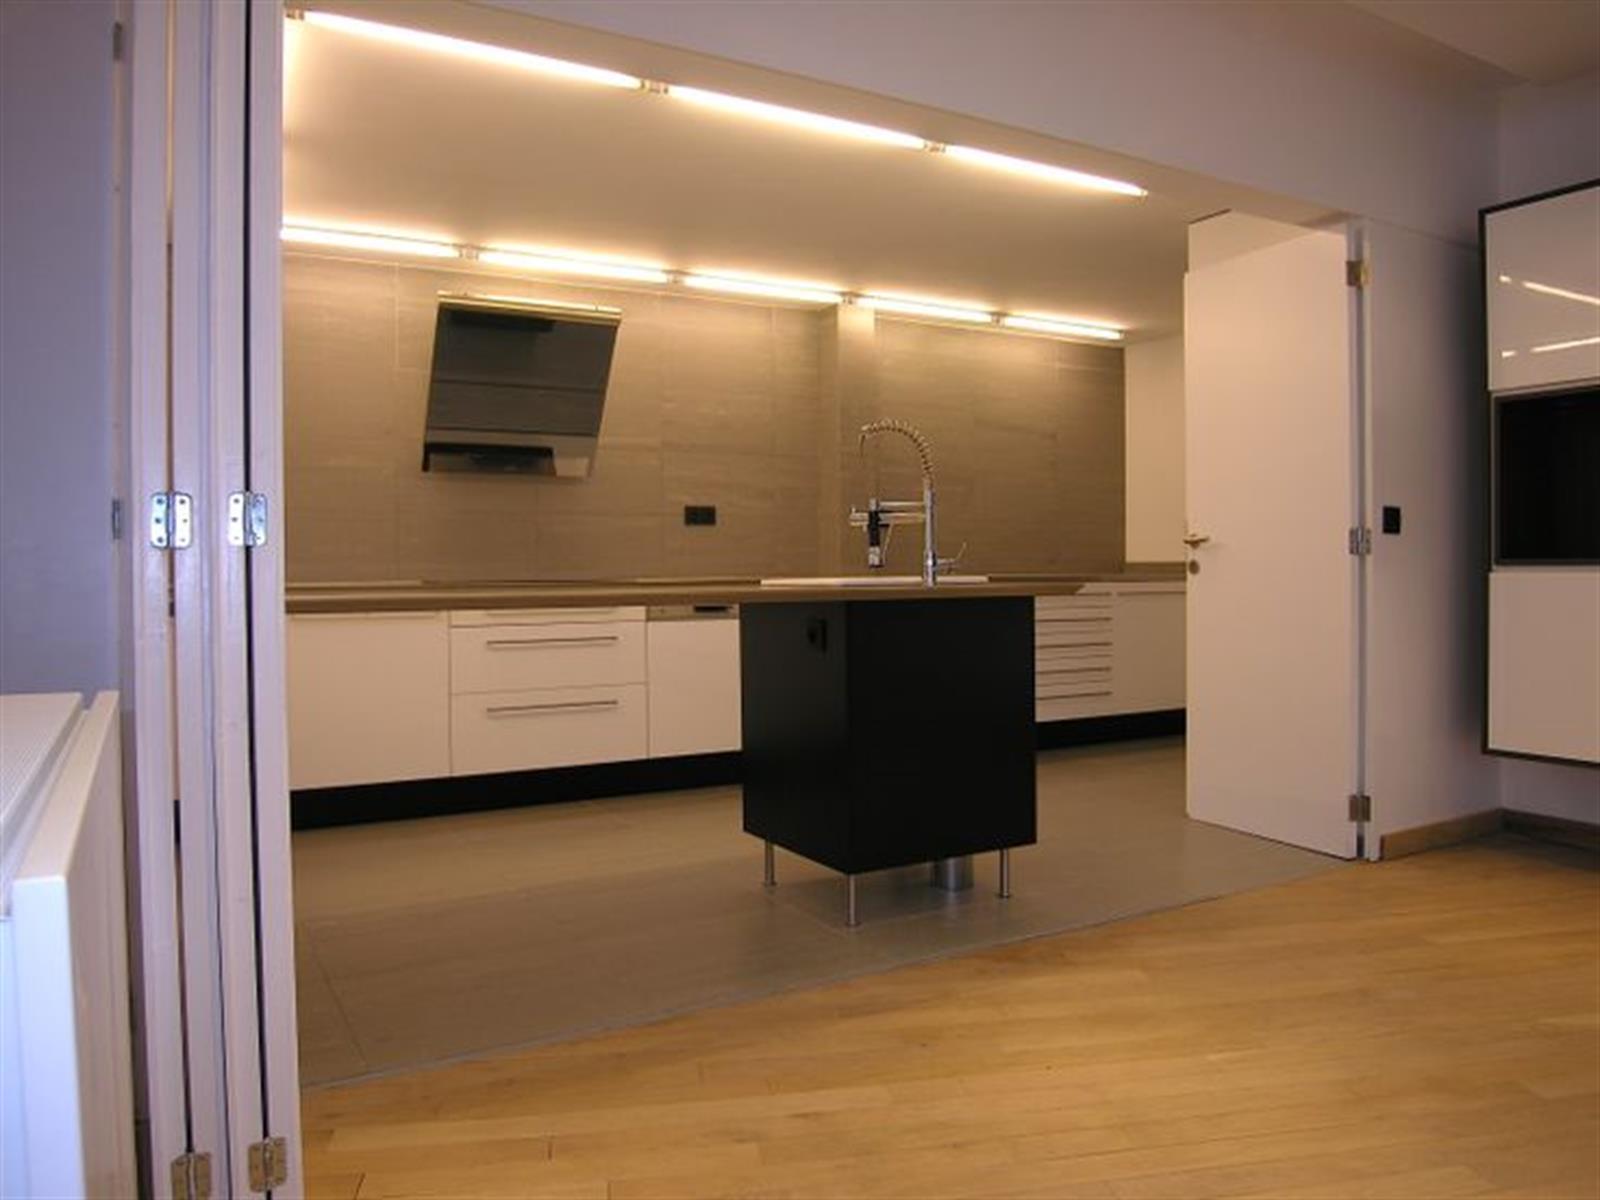 House - Etterbeek - #4448725-7